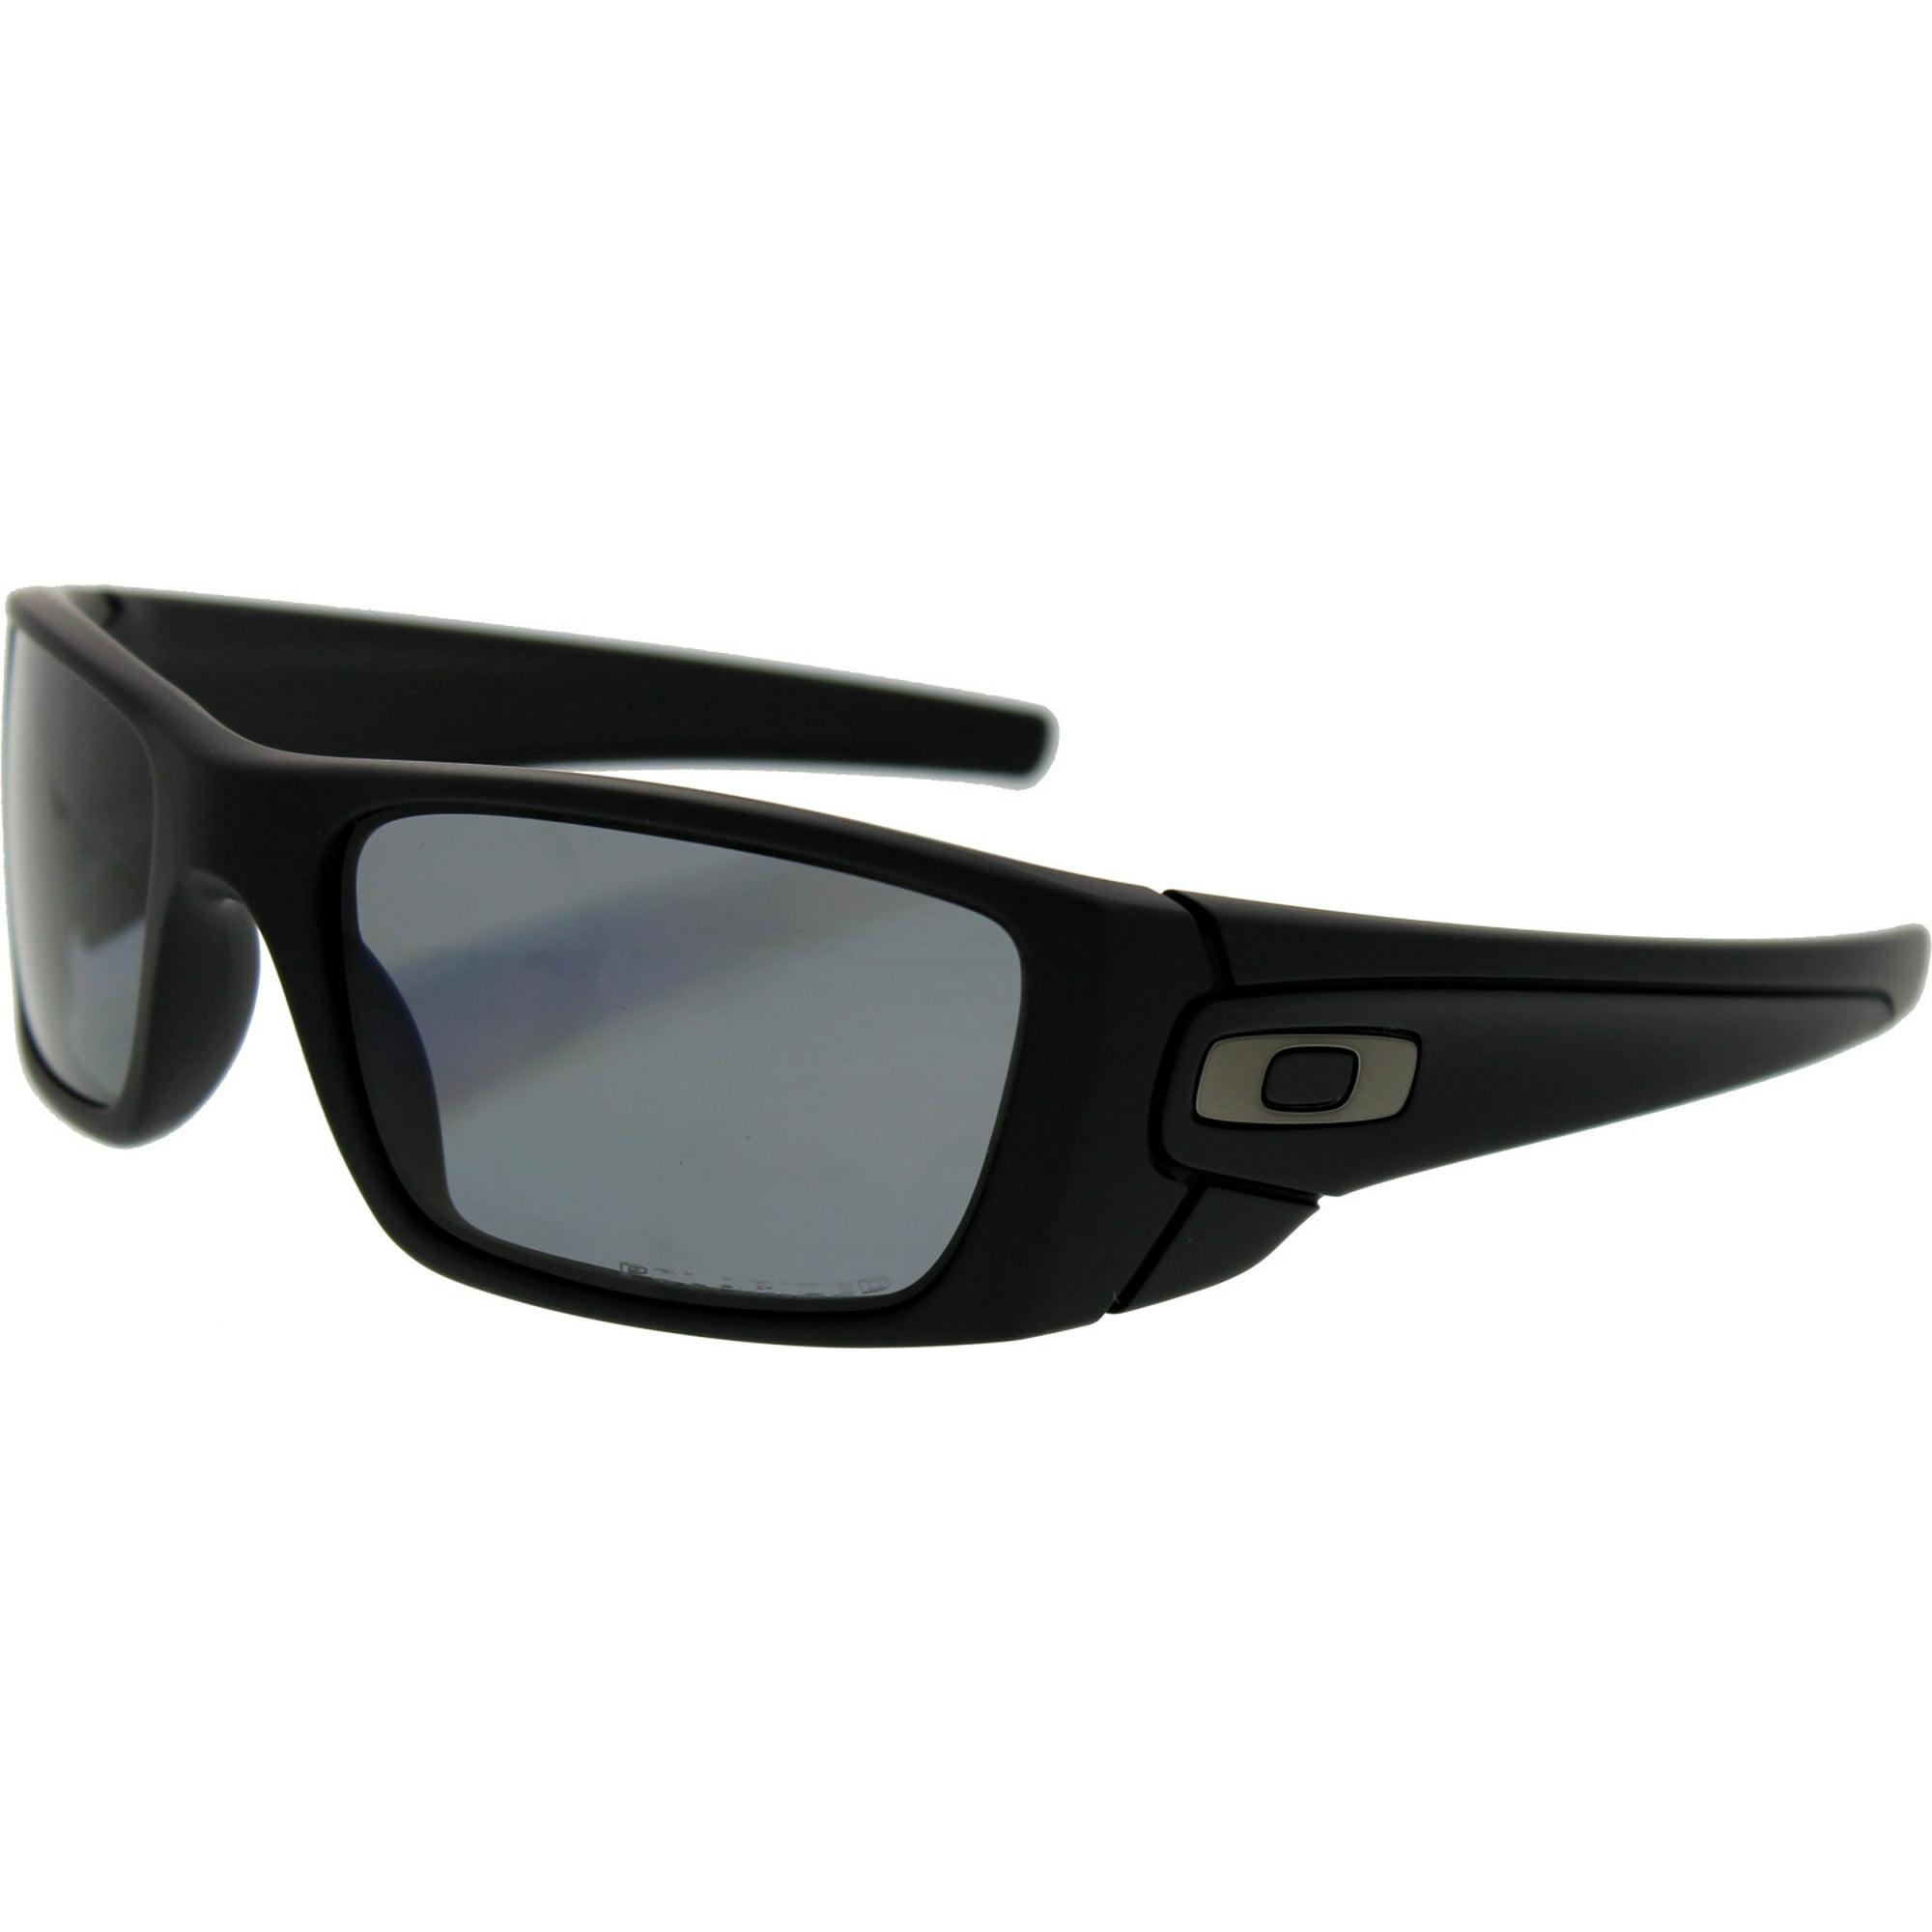 Oakley Fuel Cell Polarized >> Oakley Men S Polarized Fuel Cell Oo9096 05 Black Rectangle